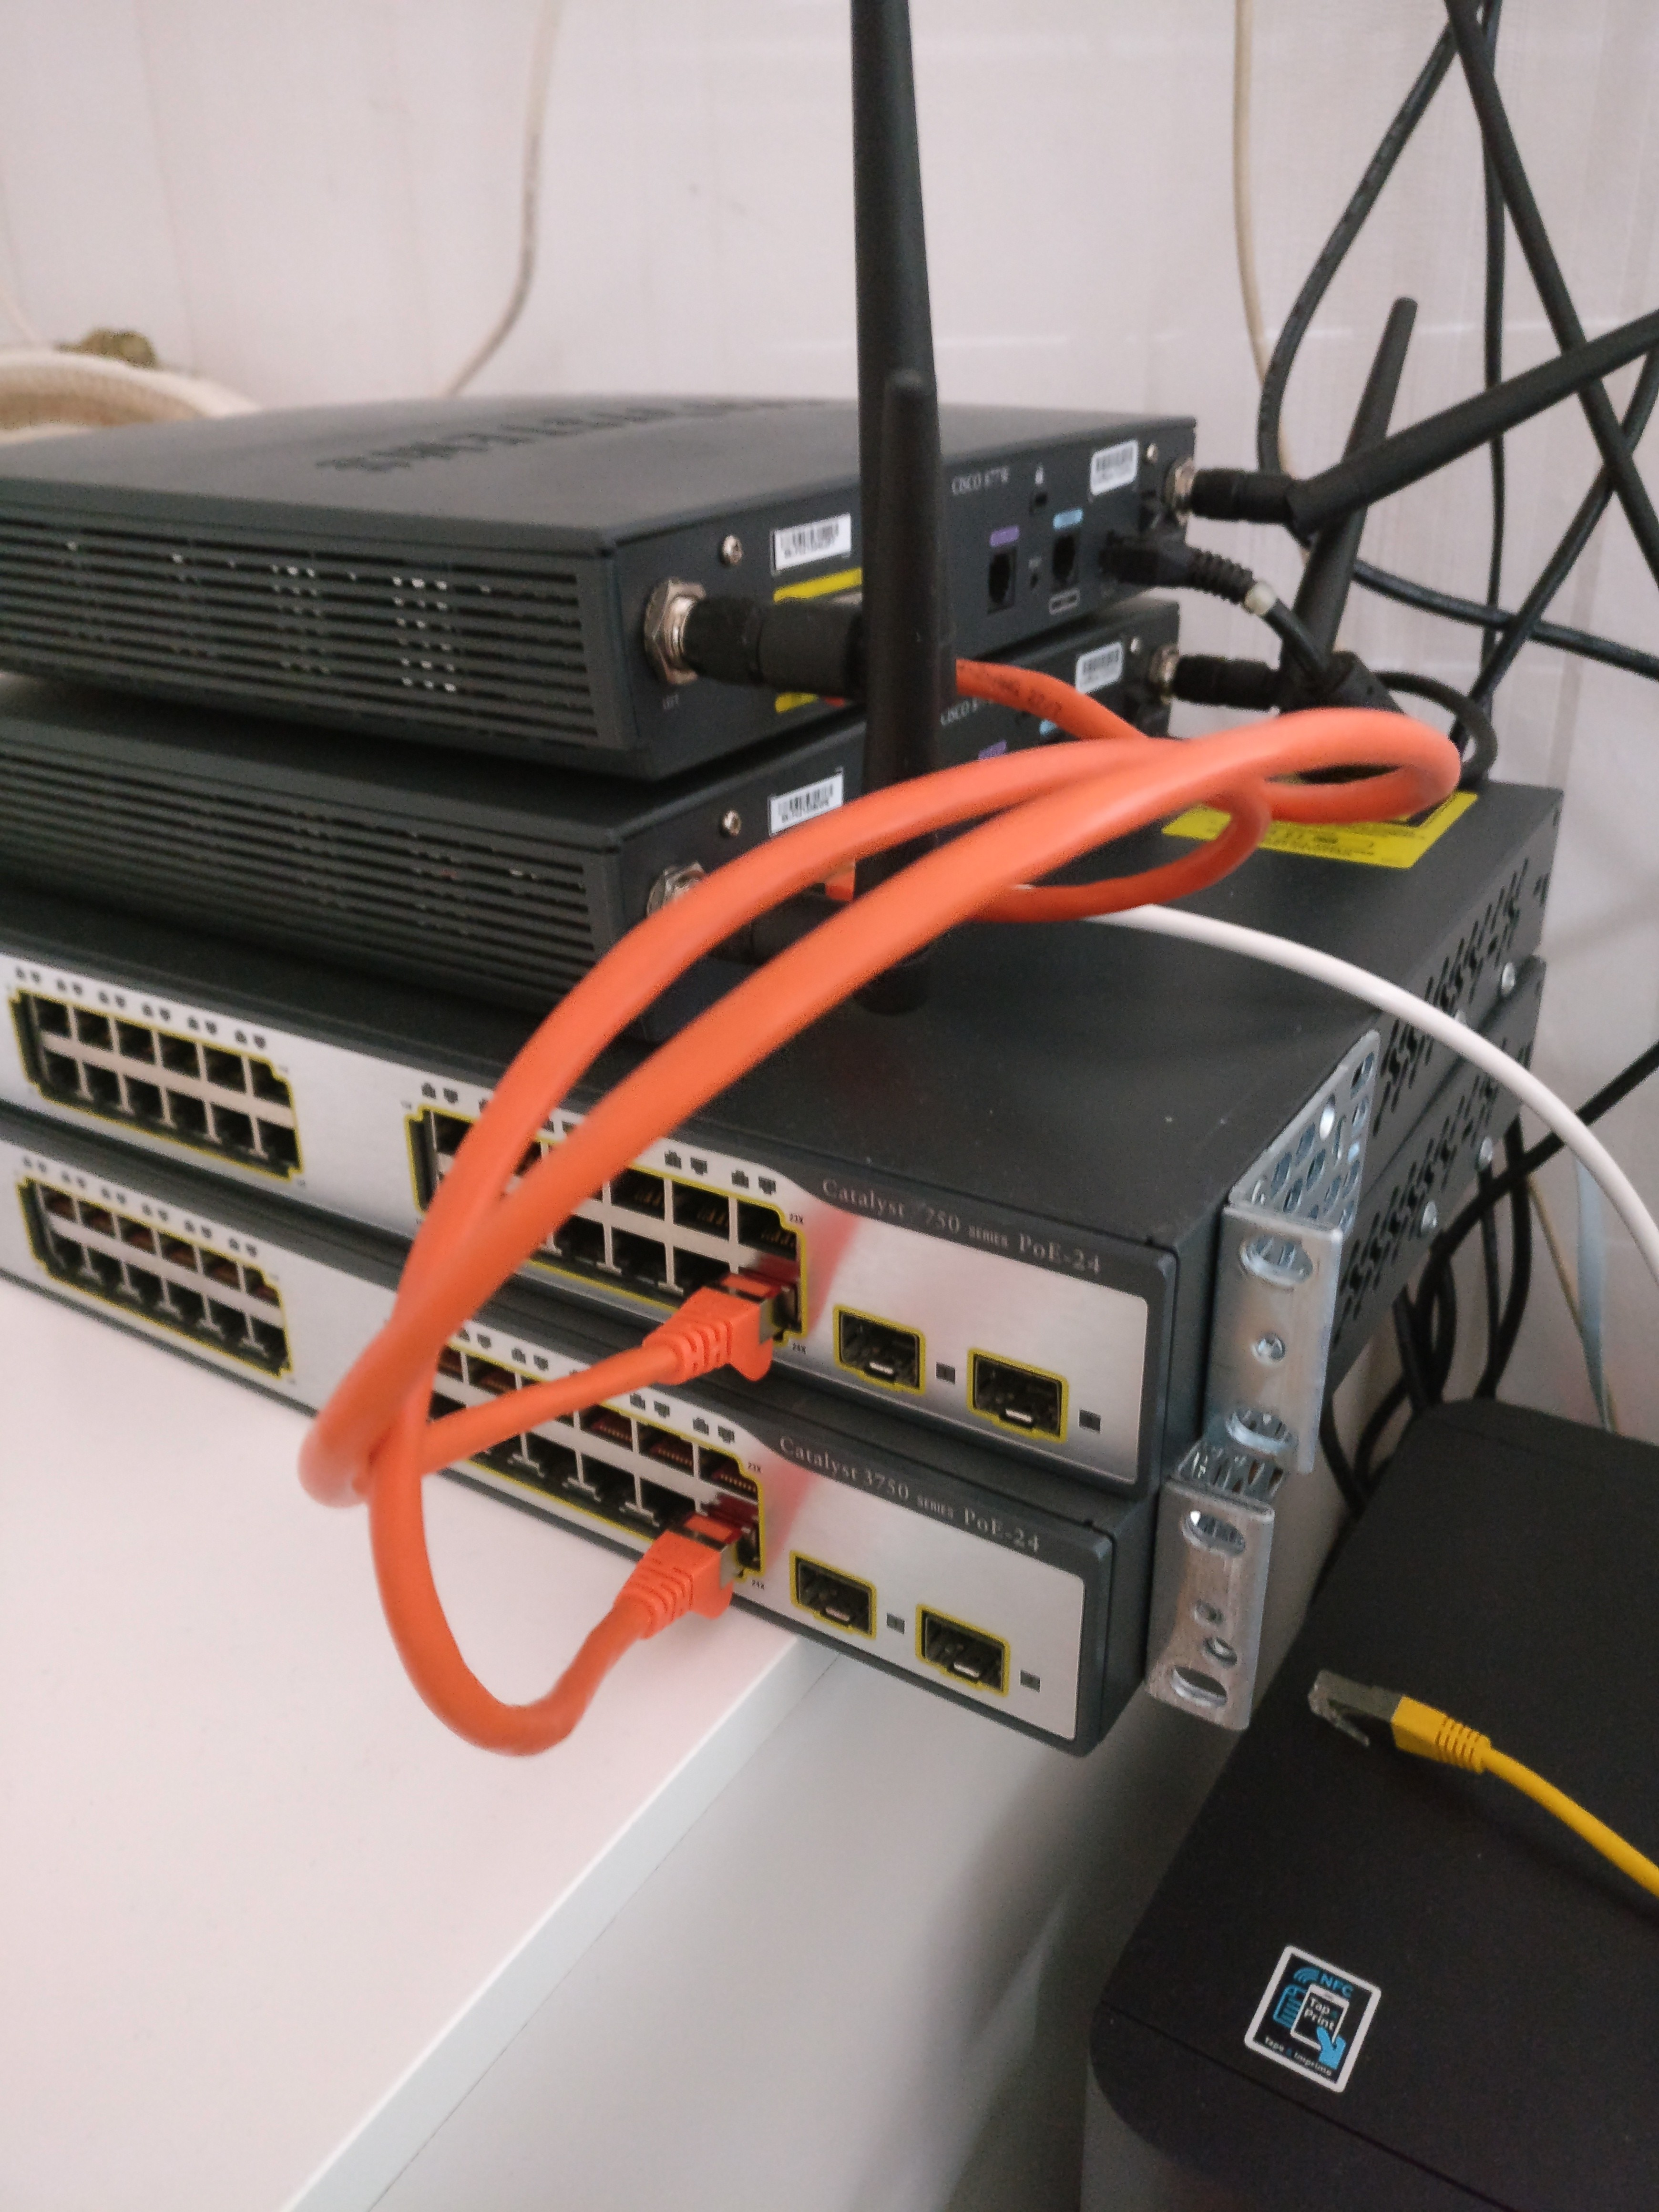 Solved: ICND1 lab setup - Page 2 - Cisco Community